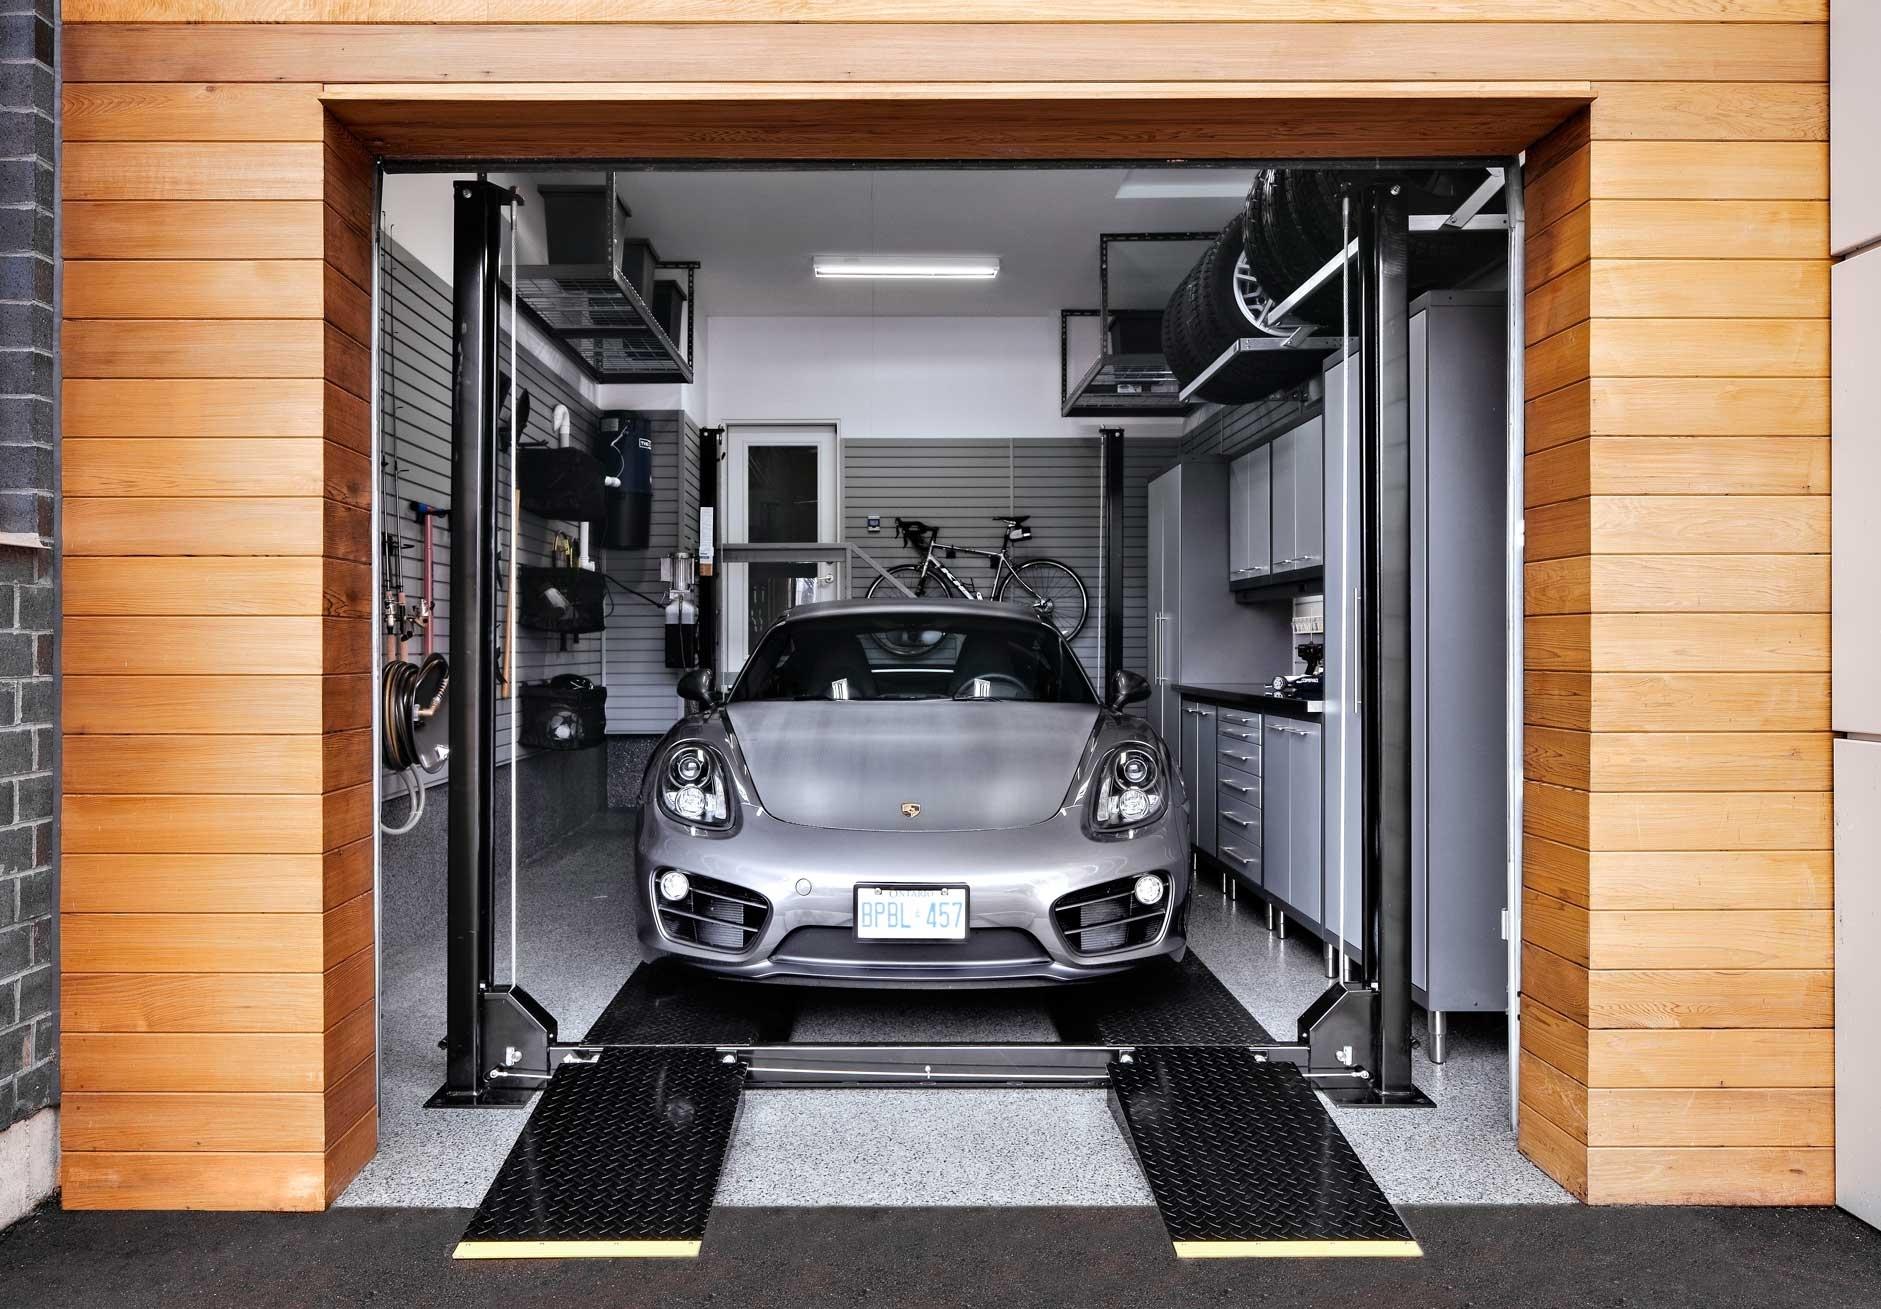 2 Post Car Lift For Home Garage Schmidt Gallery Design